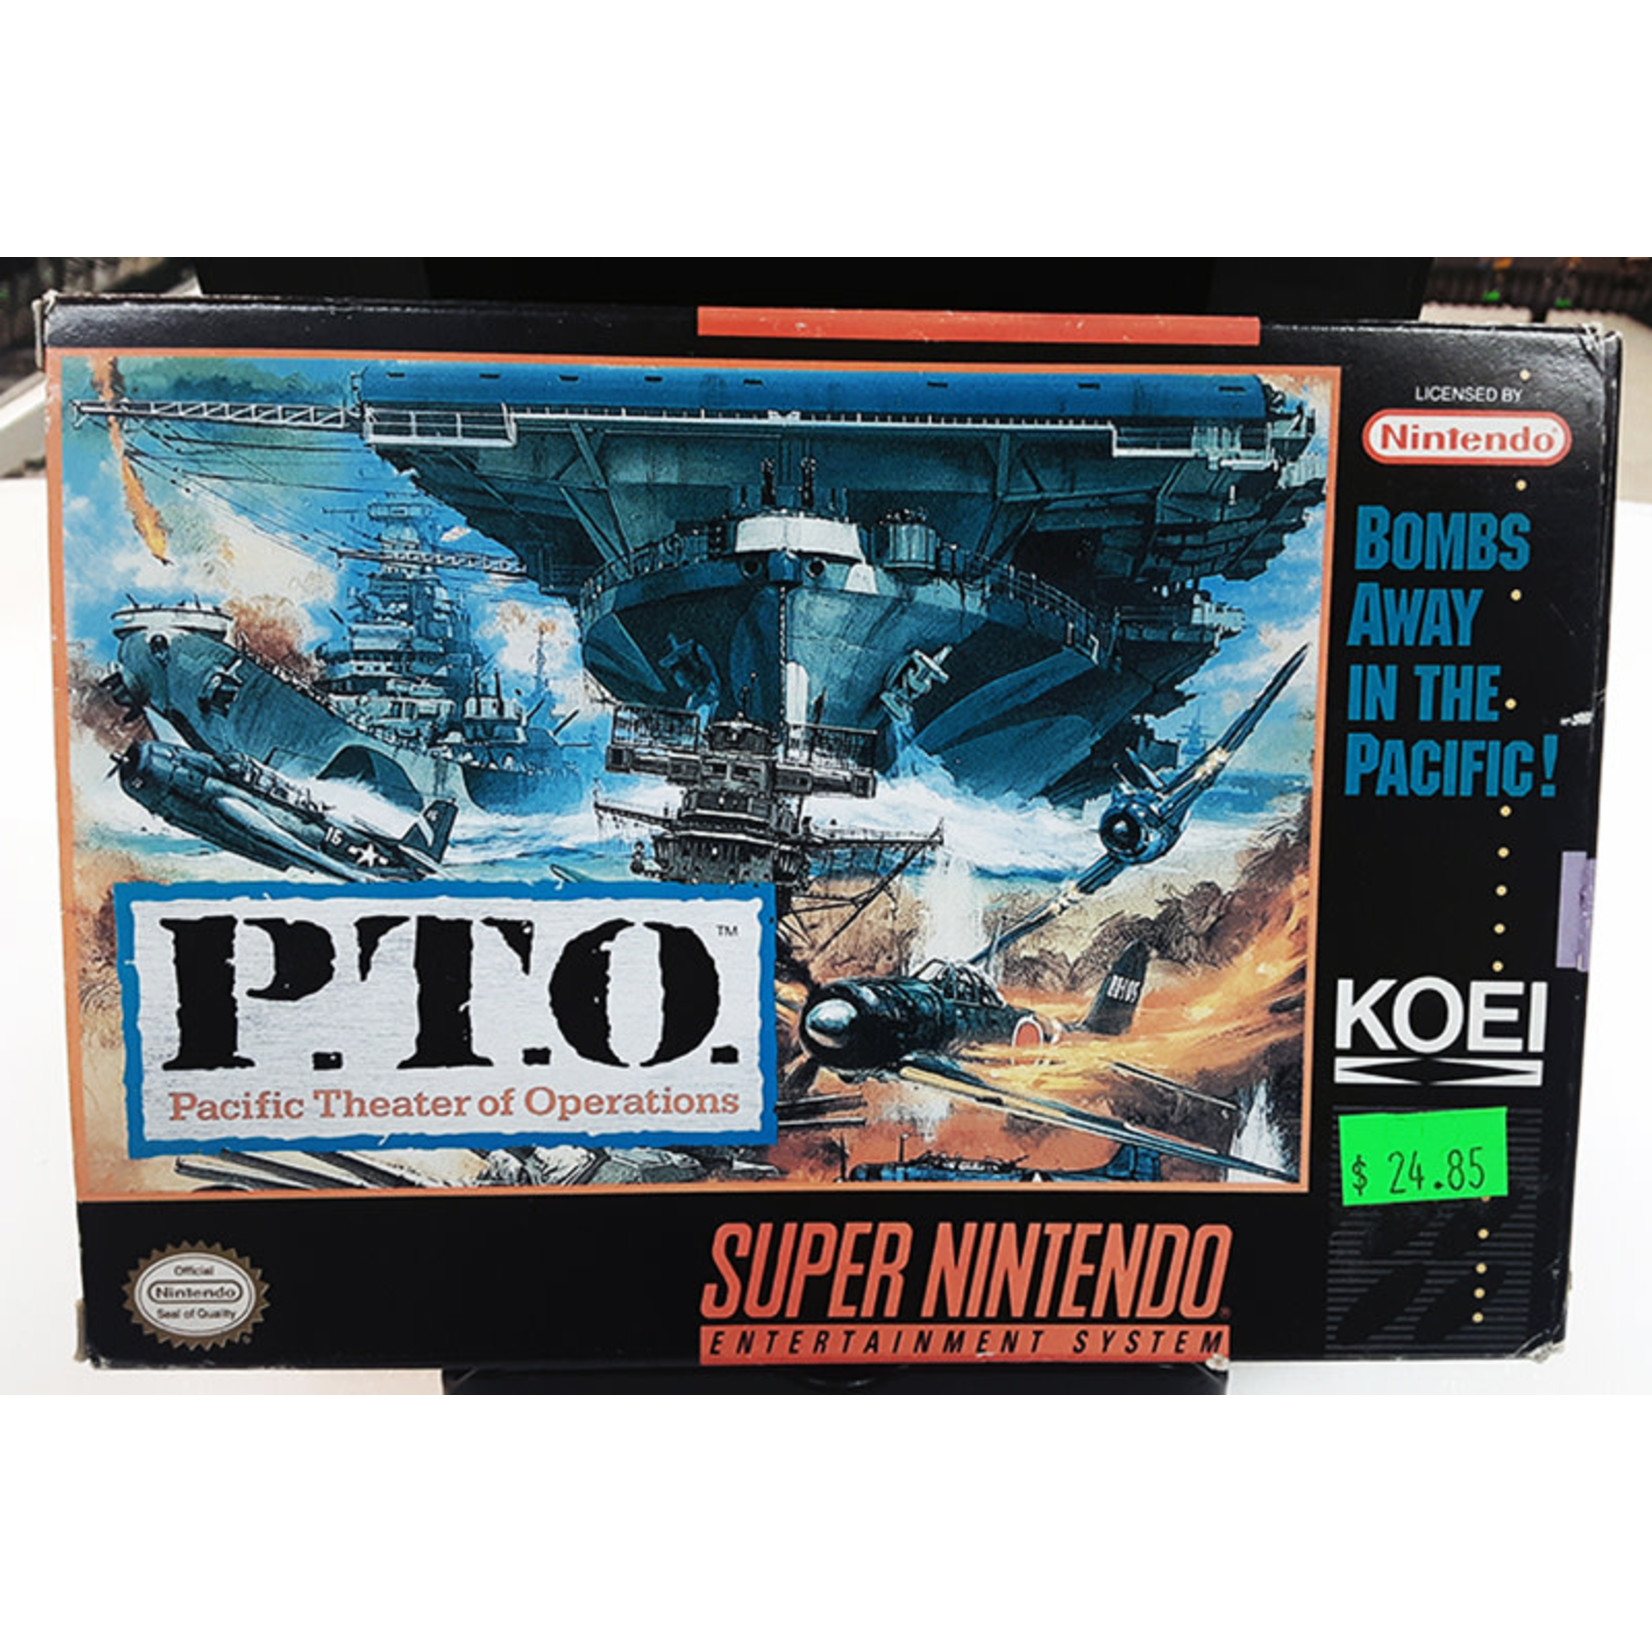 snesu-P.T.O Pacific Theater of Operations (in box)